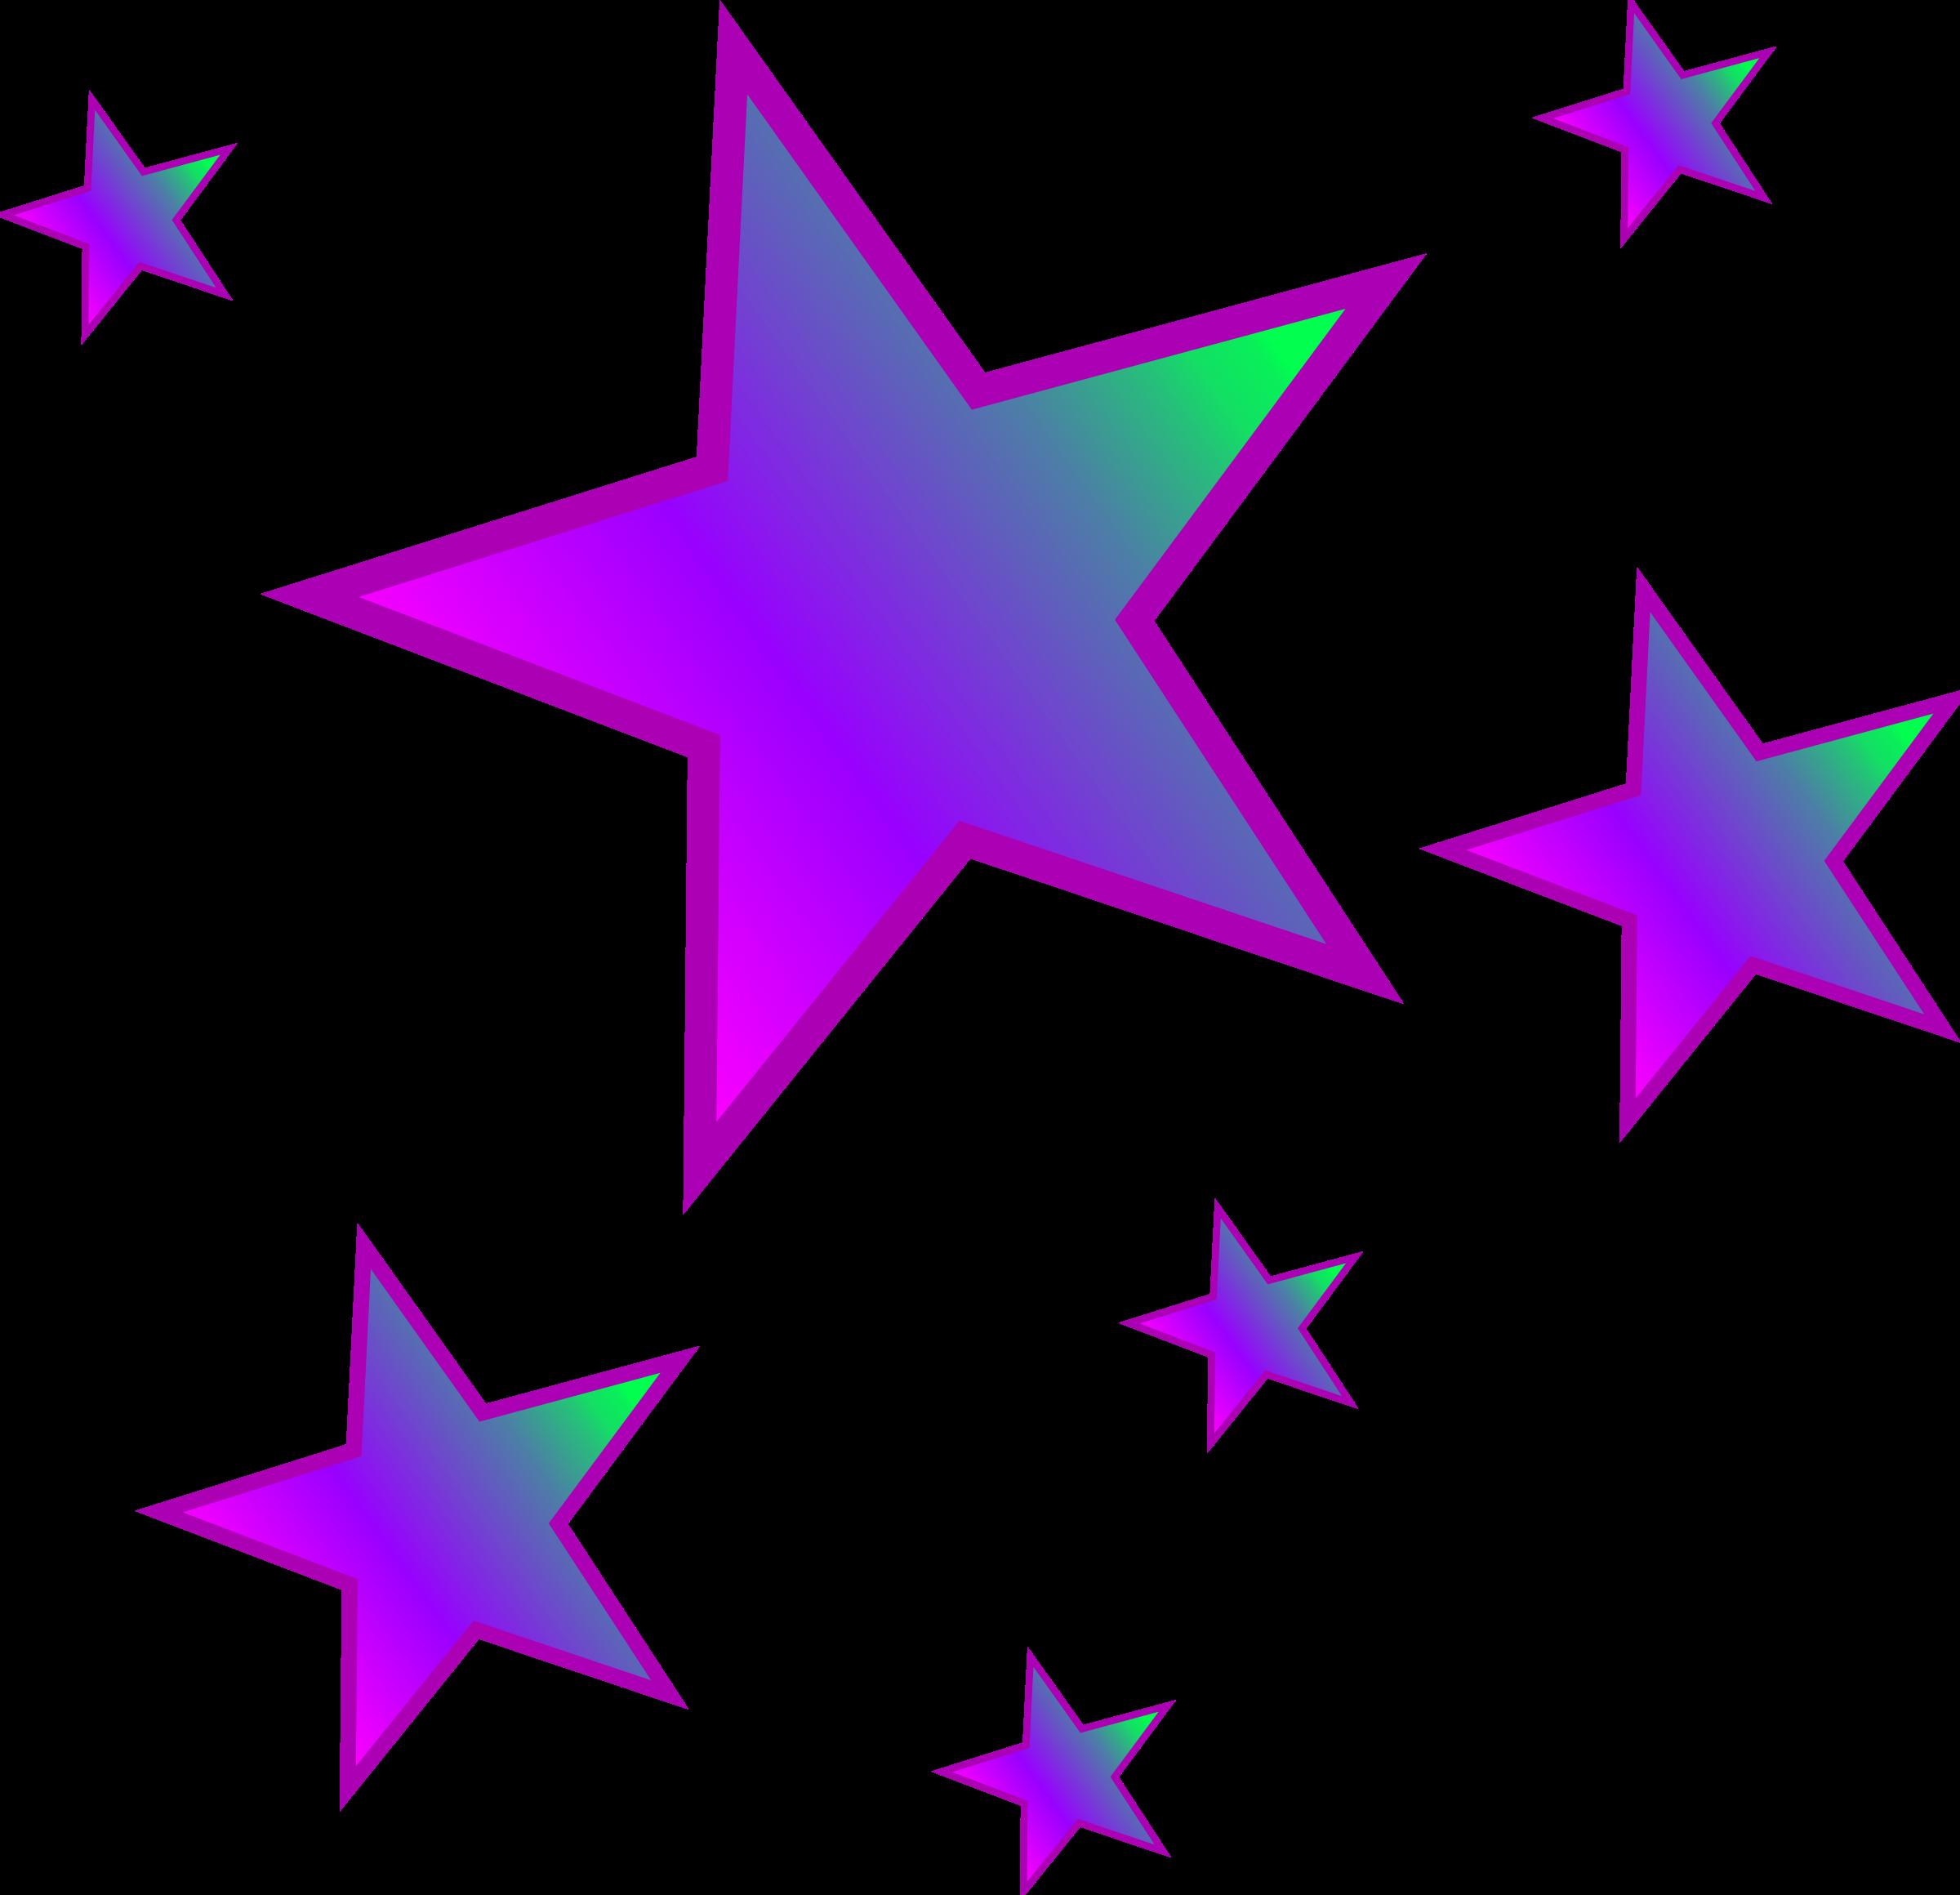 Pink cross clipart transparent transparent stock Stars clipart - ClipartFest transparent stock